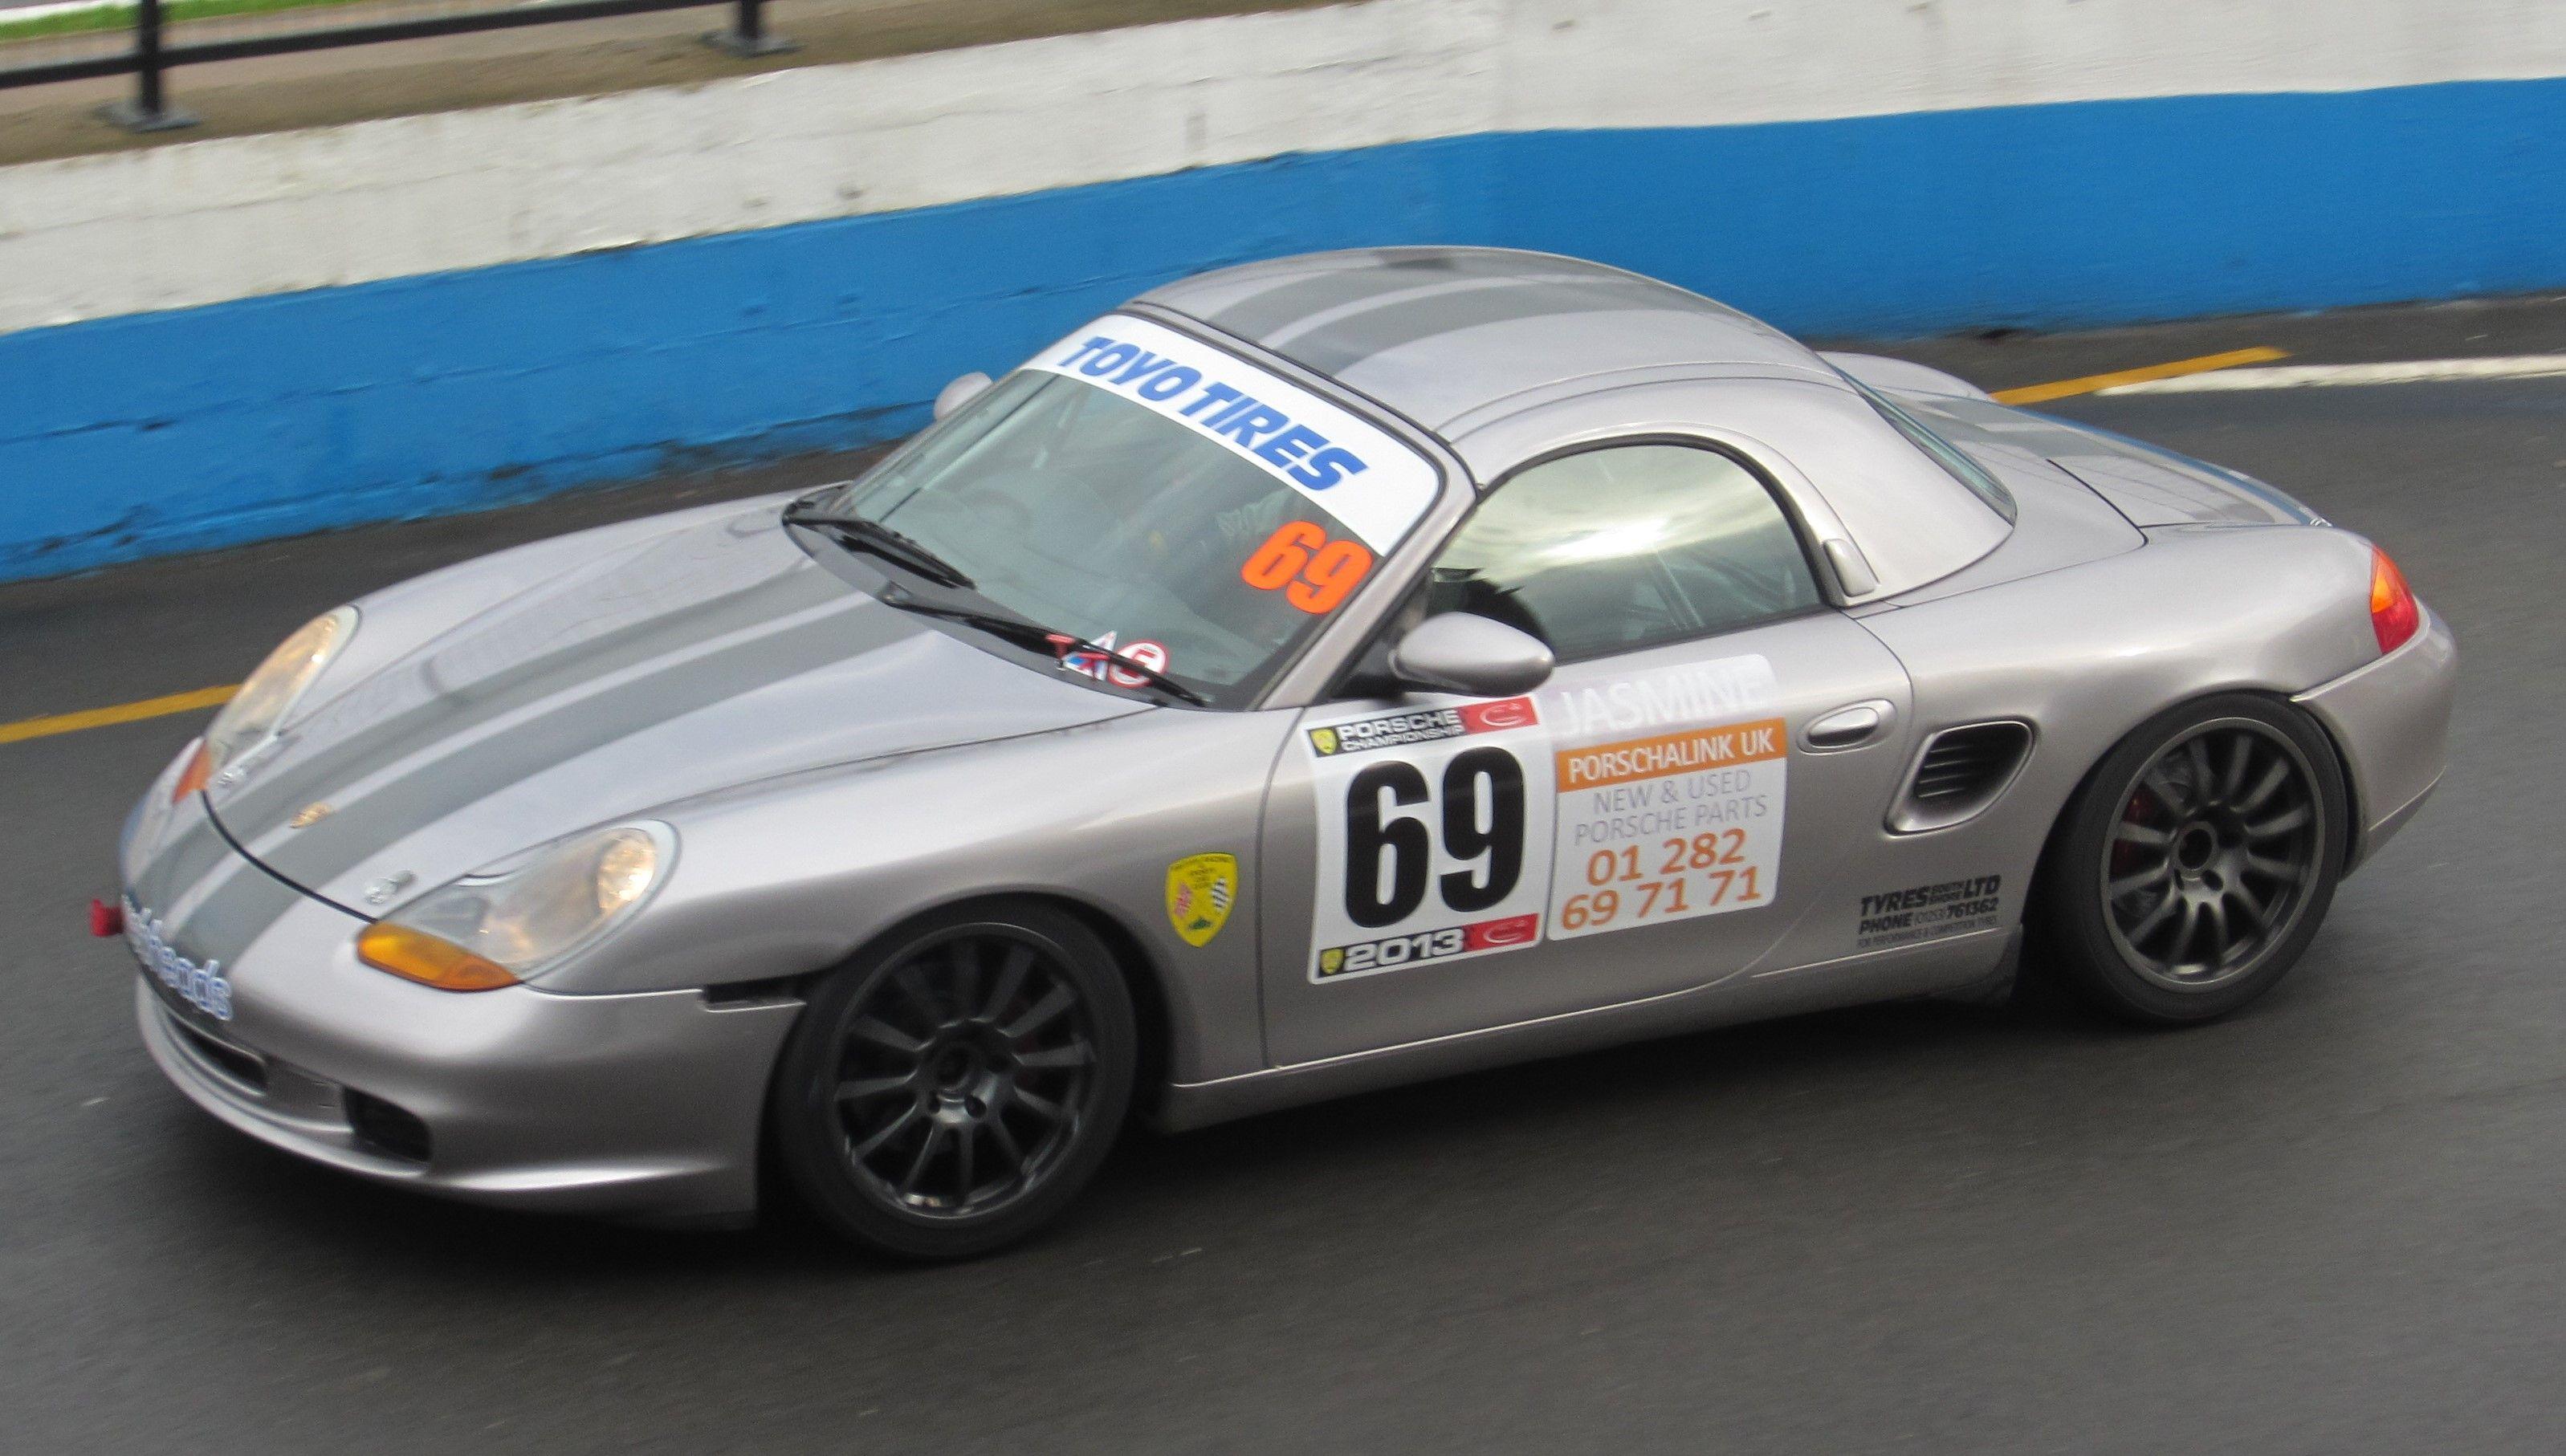 Toyo Tyres Porsche Championship, 19/20th October Donington Park 2013.